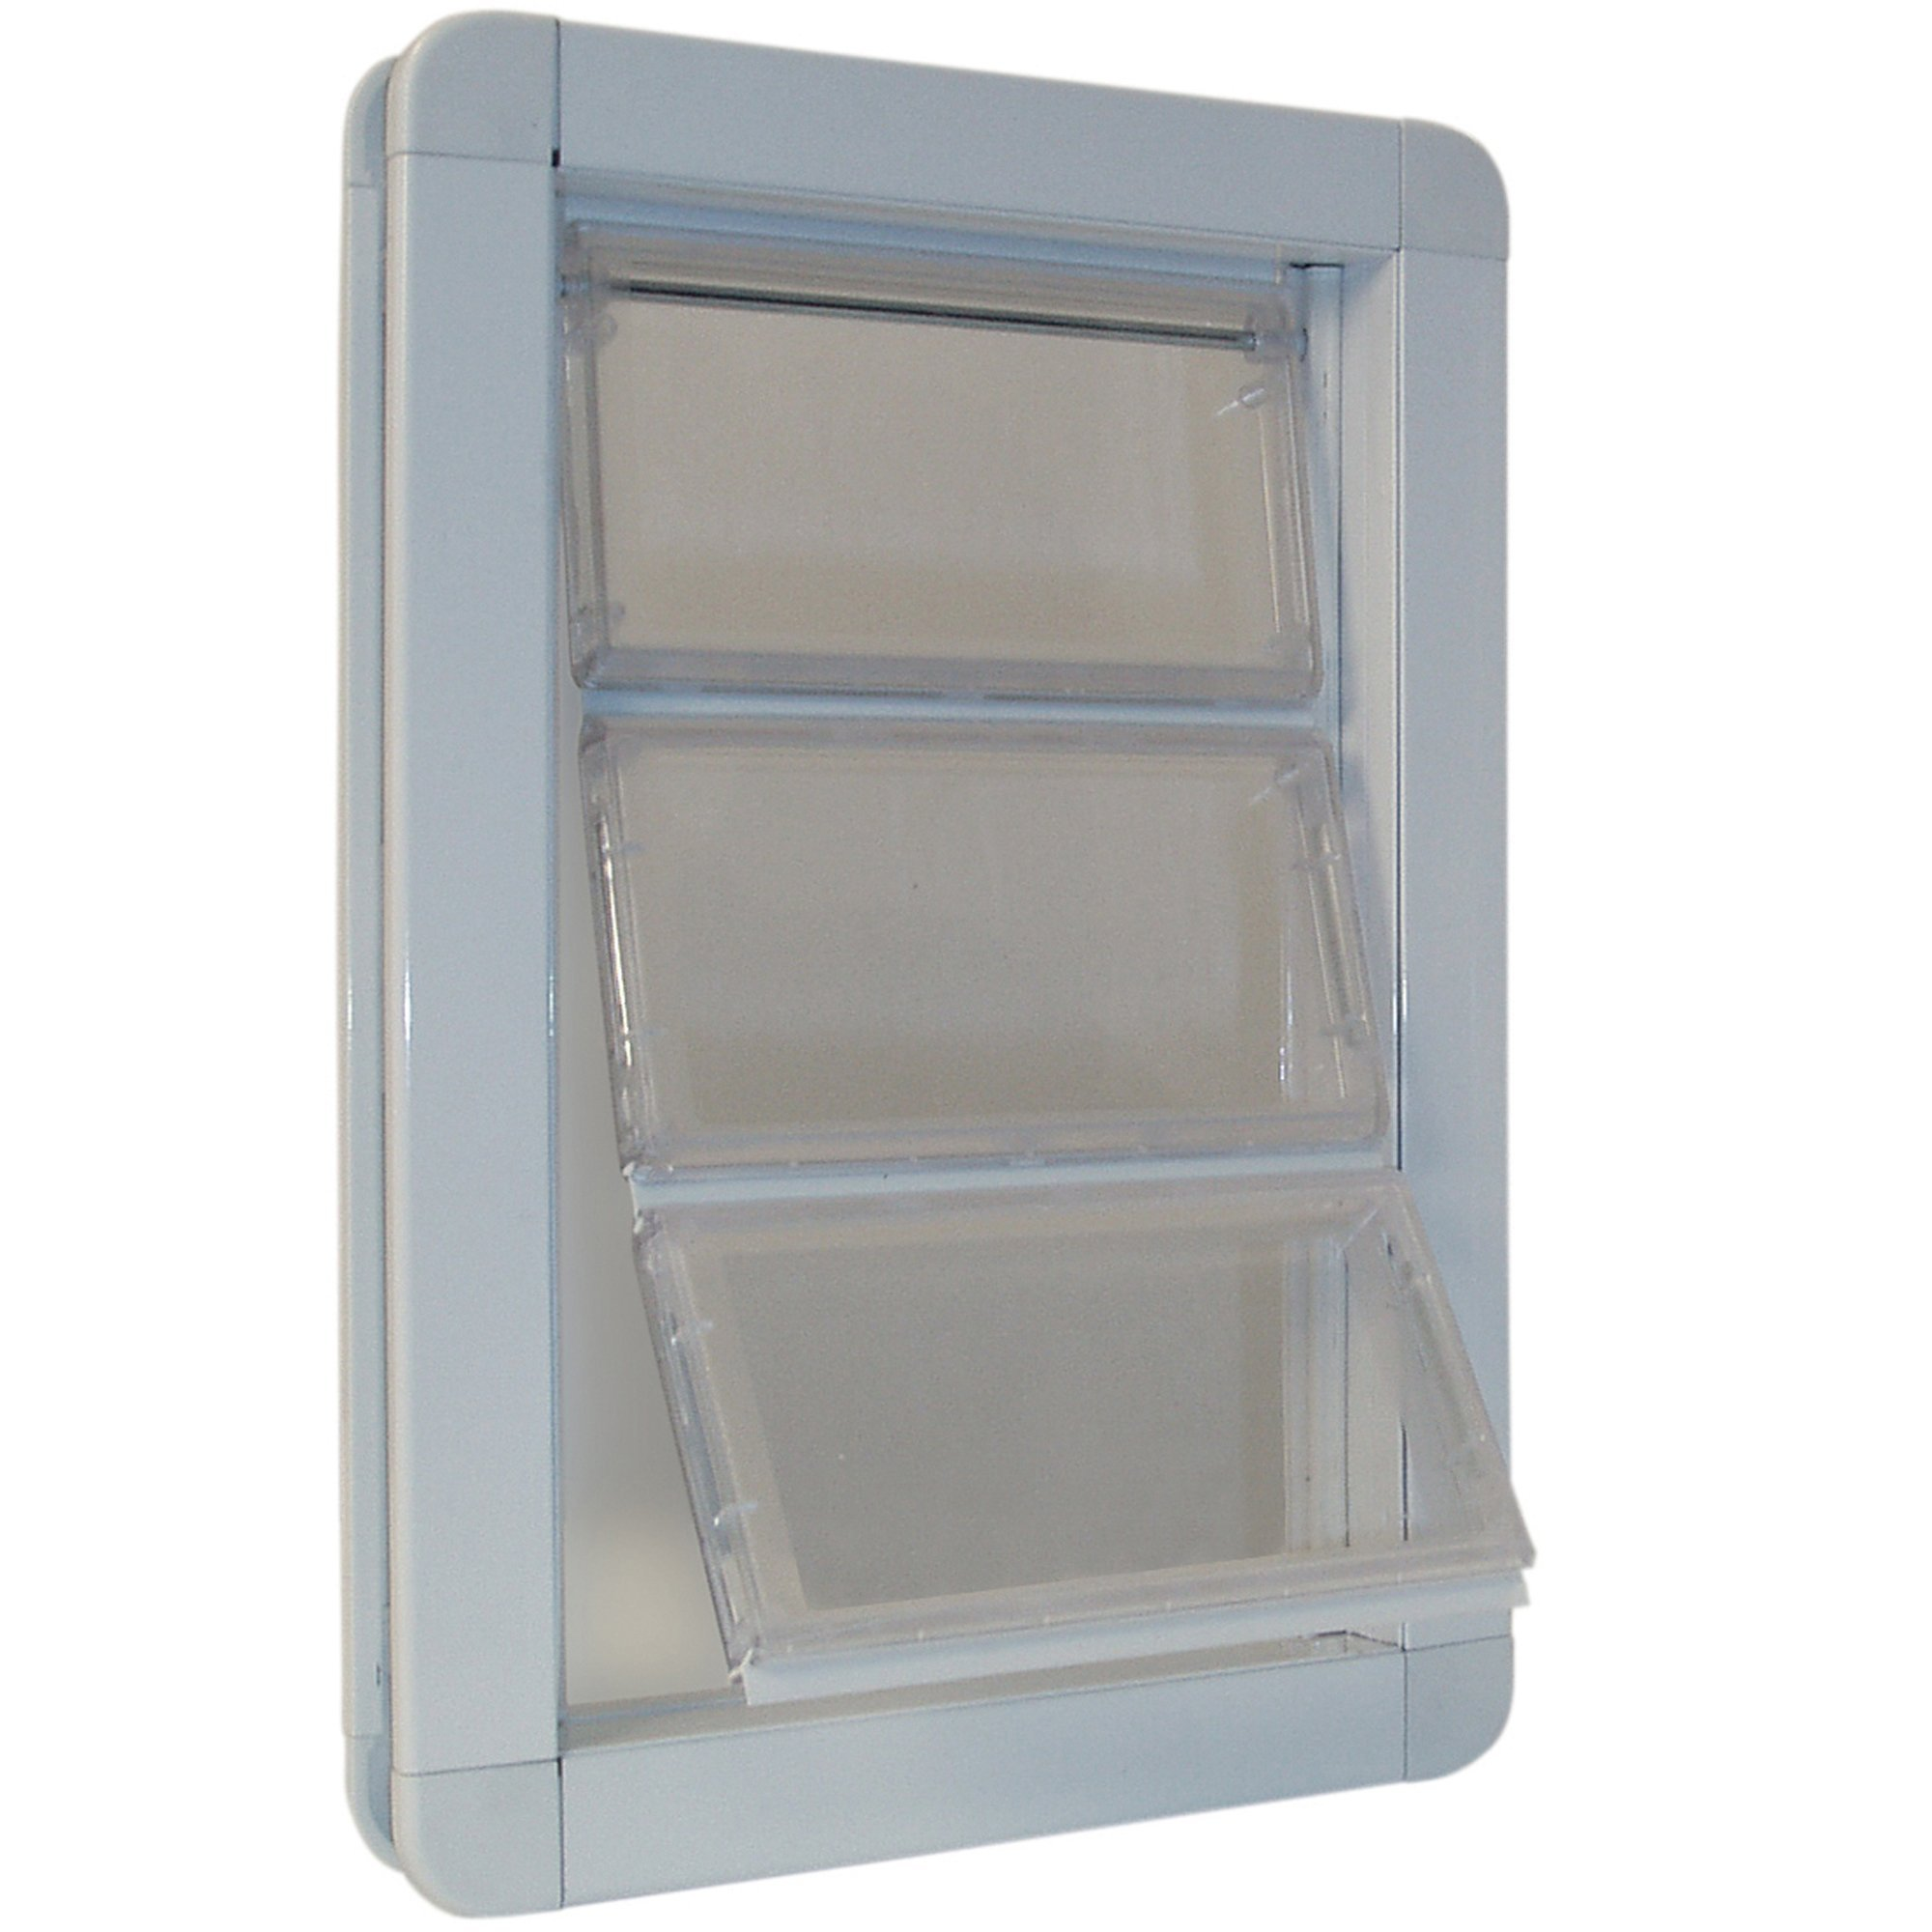 Perfect Pet Premium Draft Stopper Pet Door White, 17.9375IN x 2.125IN x 23.875IN, X-Large